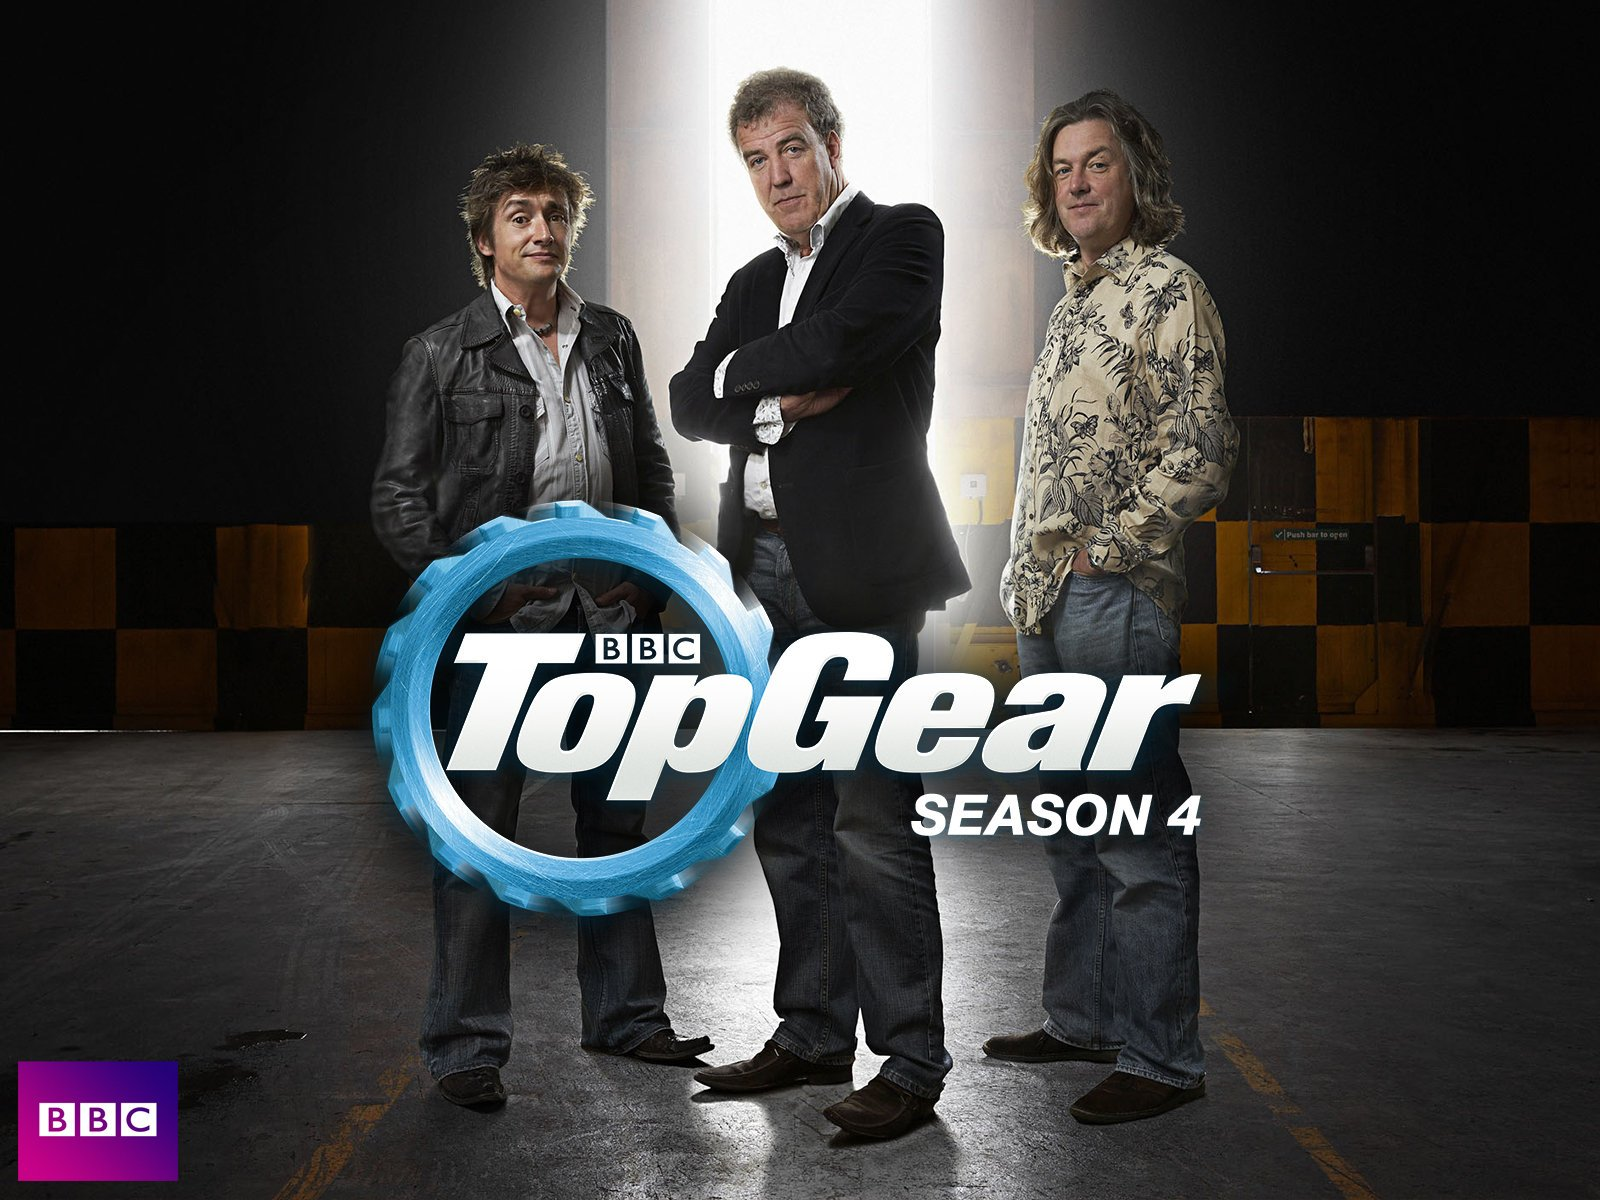 Top gear temporada 20 subtitulado online dating